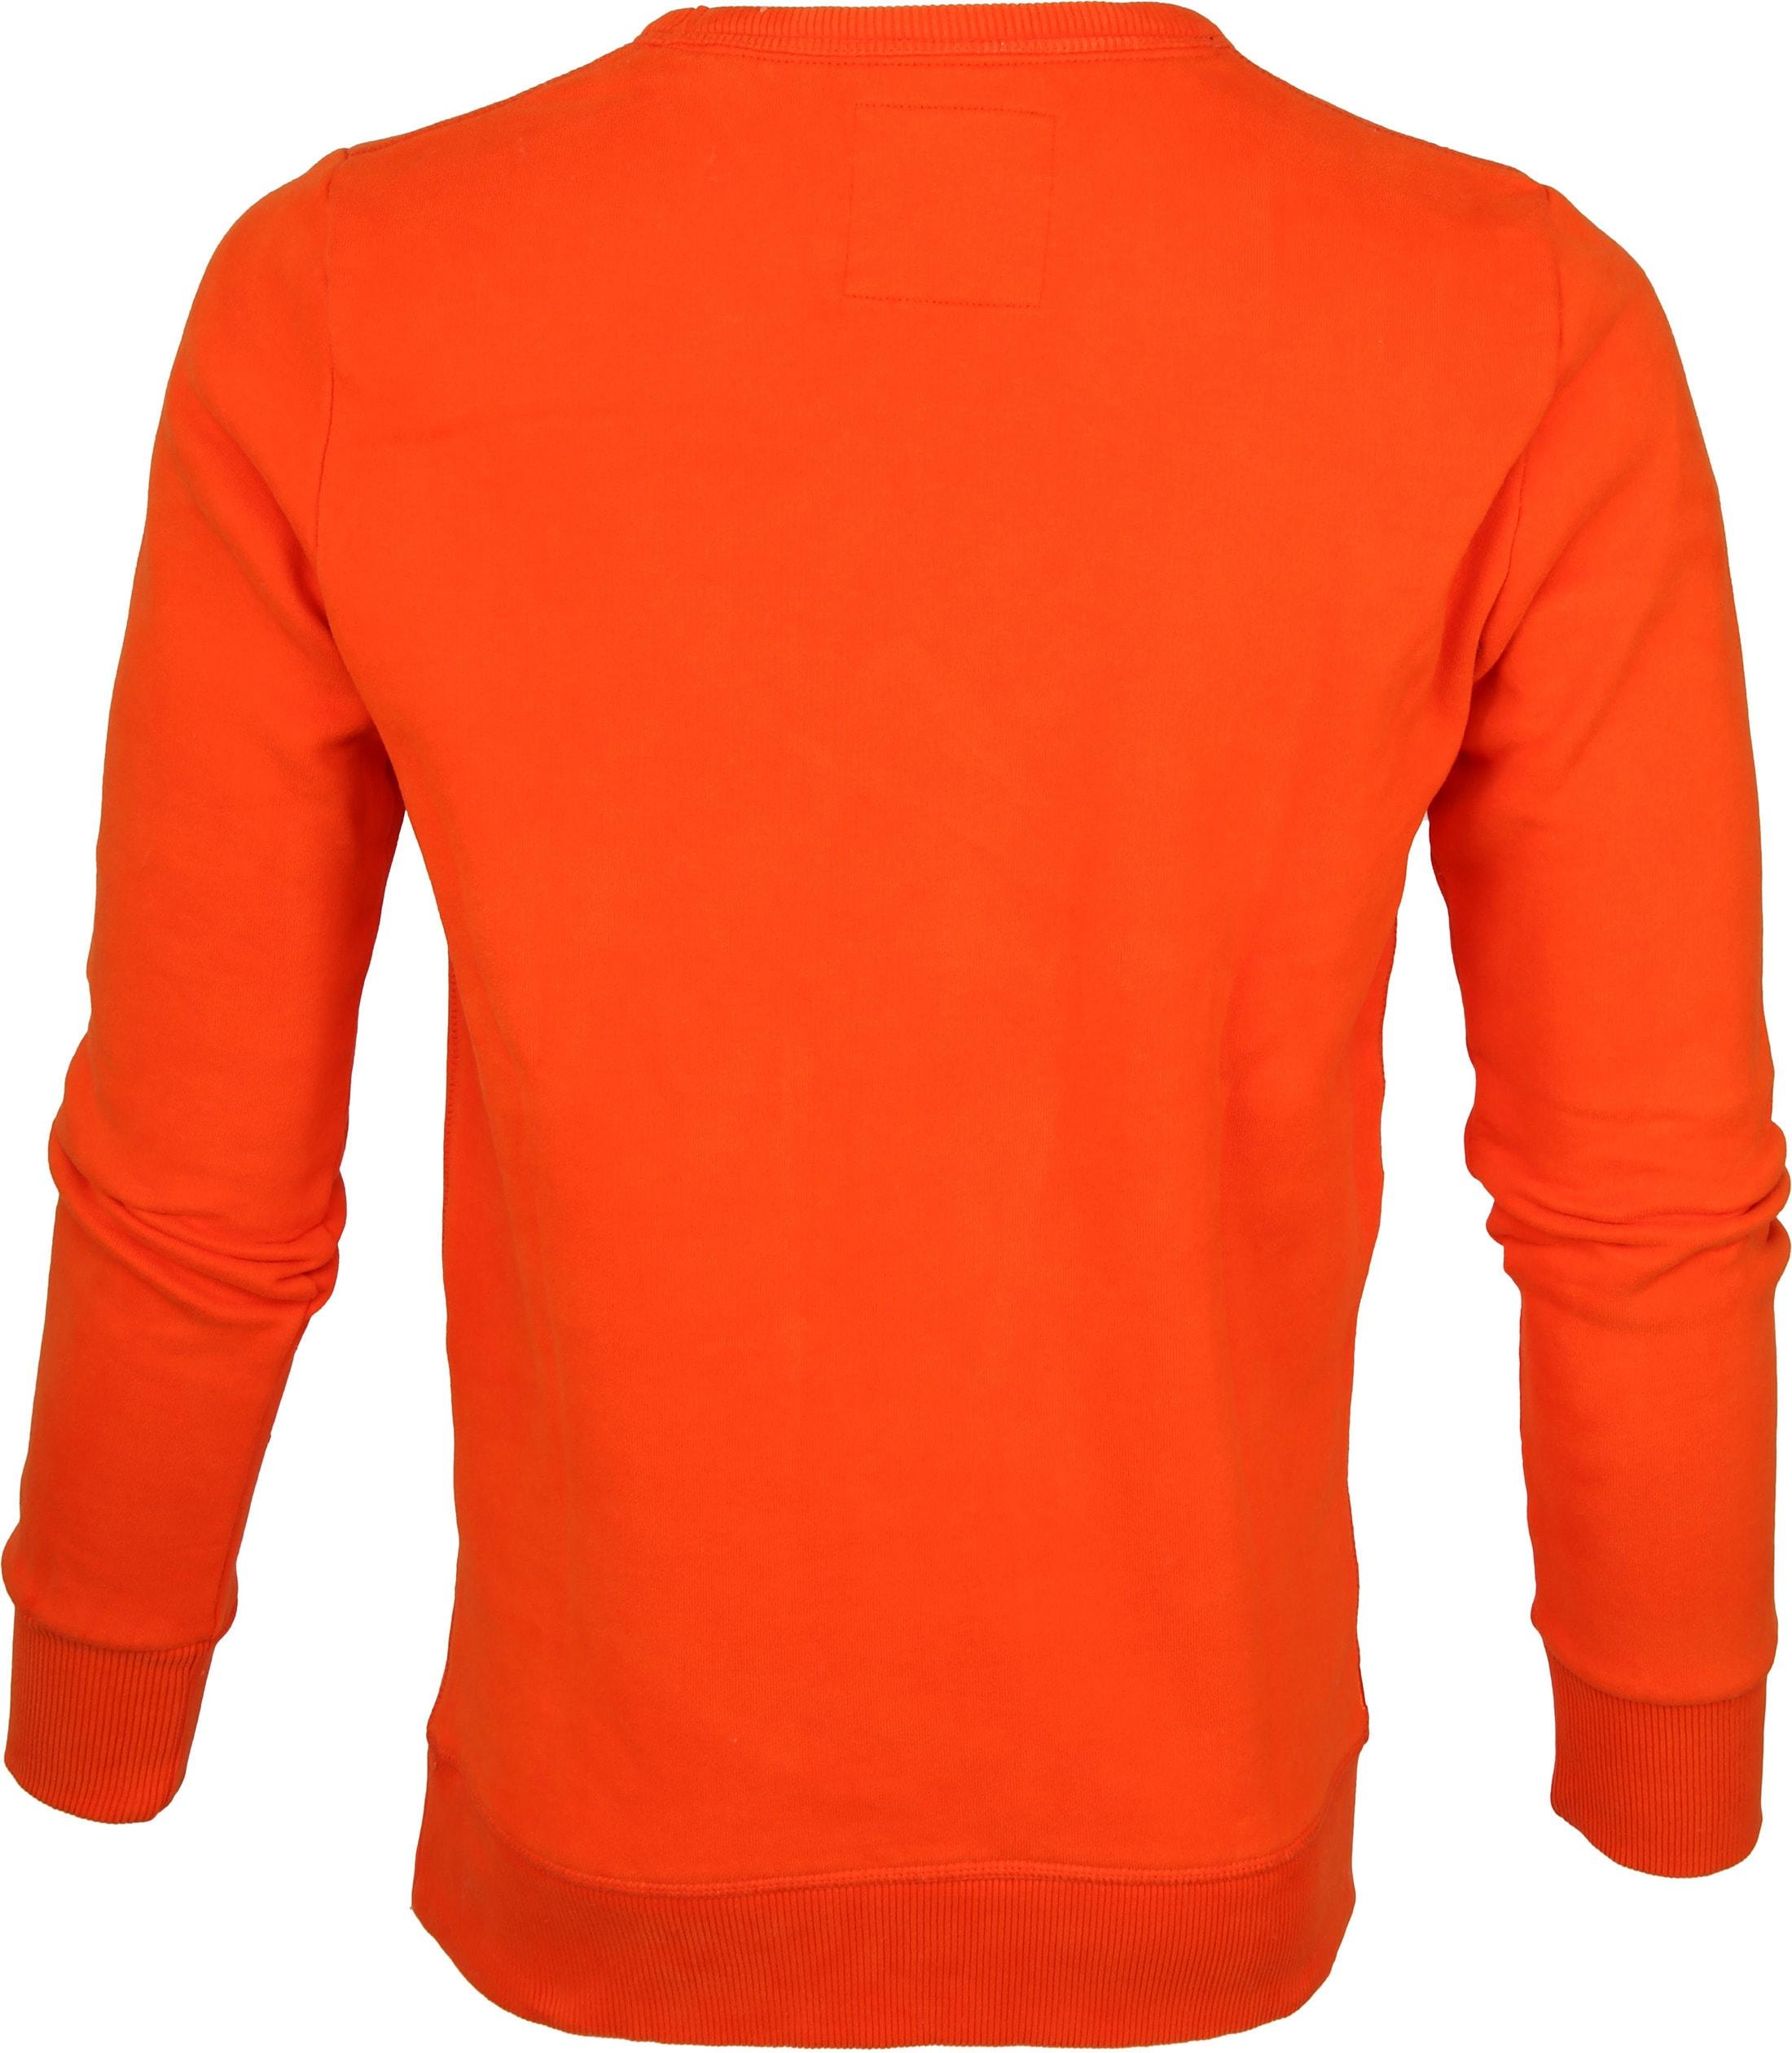 Superdry Sweater Vintage Oranje foto 2